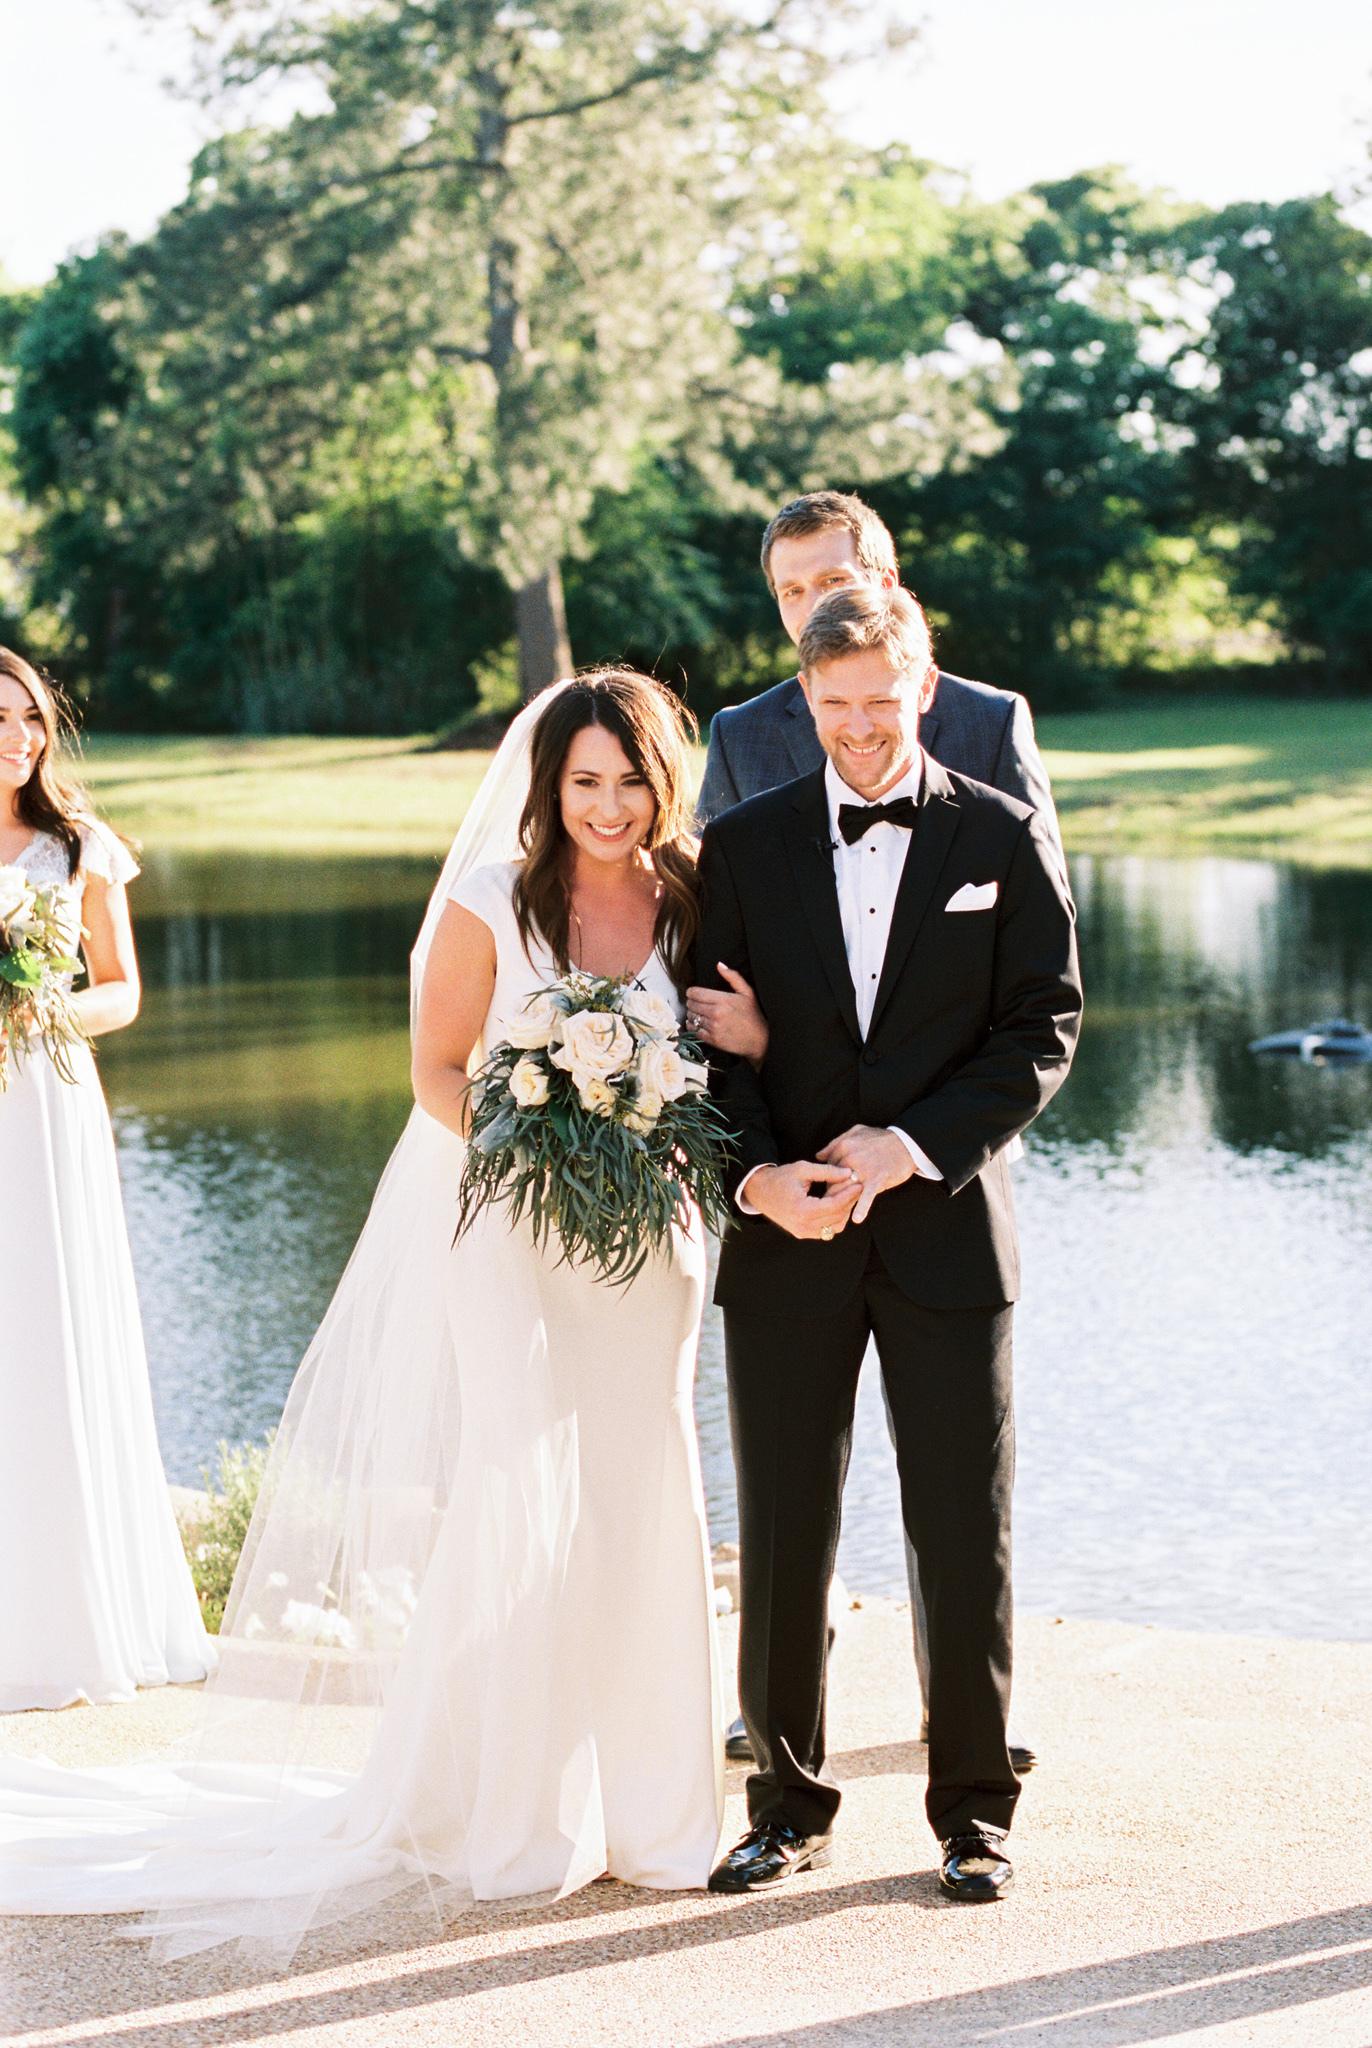 texas bride, college station, kristina ross photography, aggie bride, wind dancer retreat, texas, brazos valley bride, aggie wedding